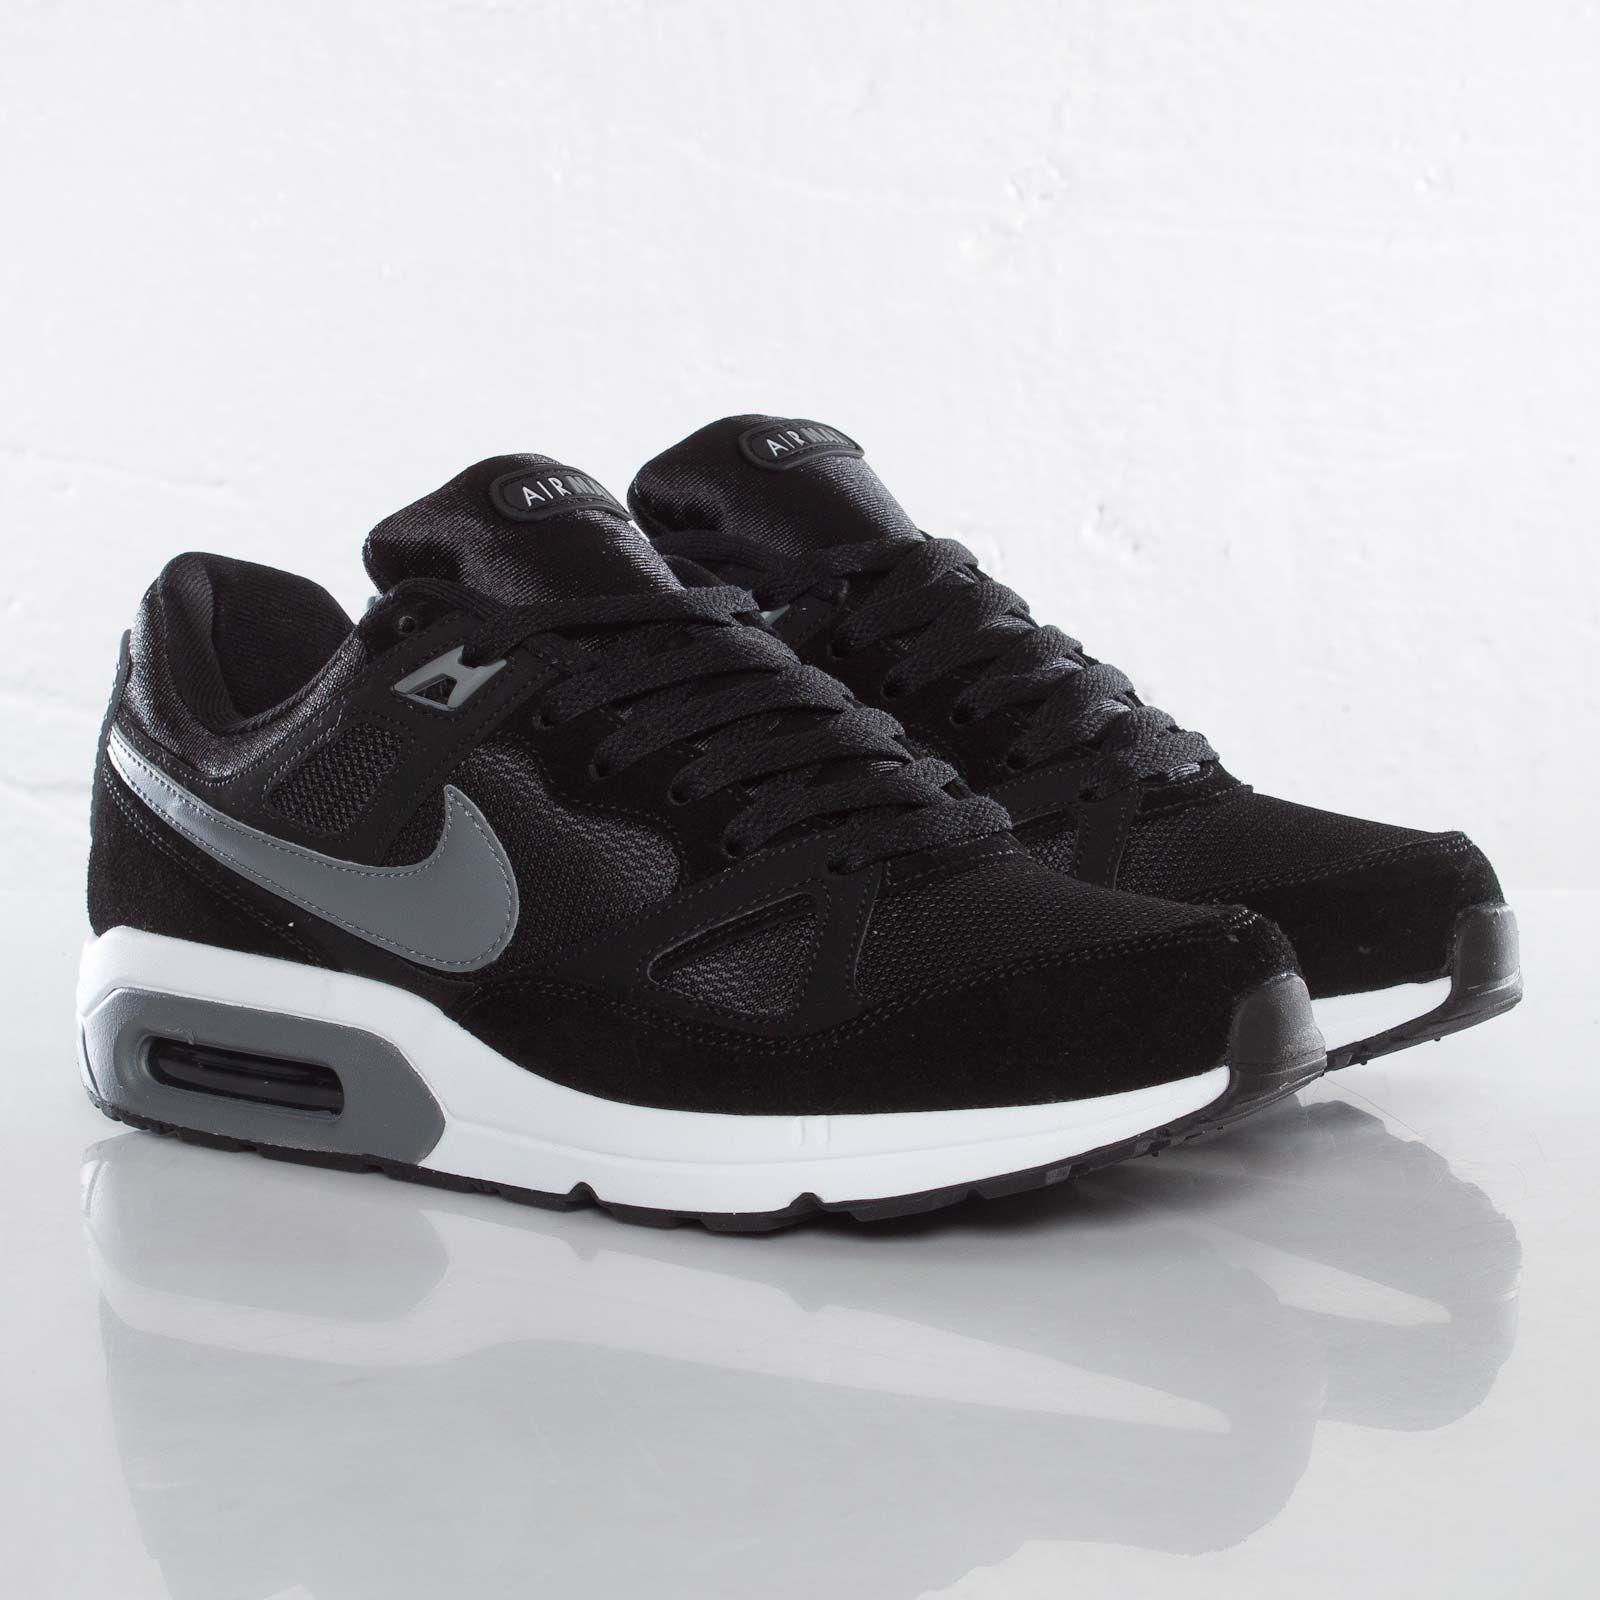 Nike Air Max Span 554666 001 Chaussuressnstuff  Chaussuress